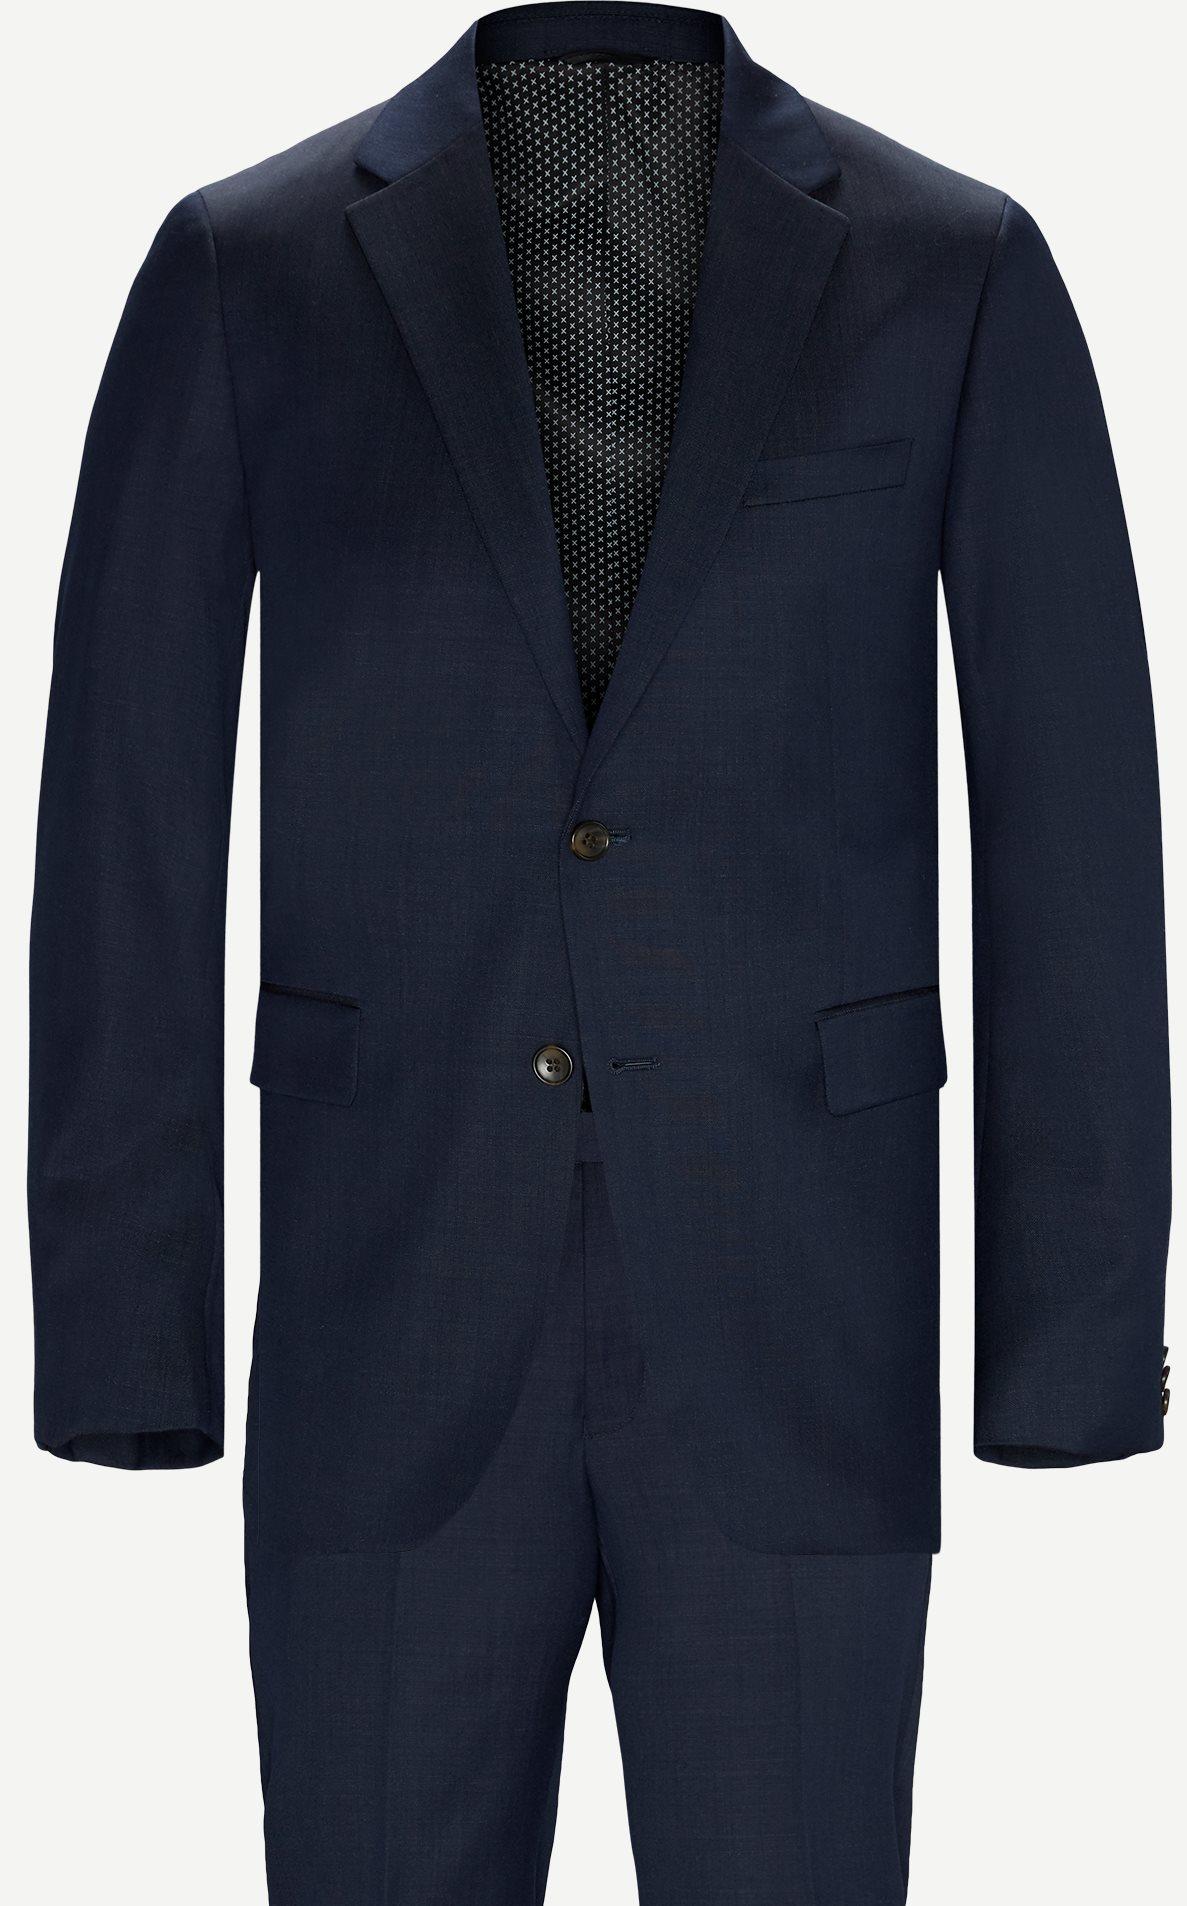 Suits - Regular - Blue